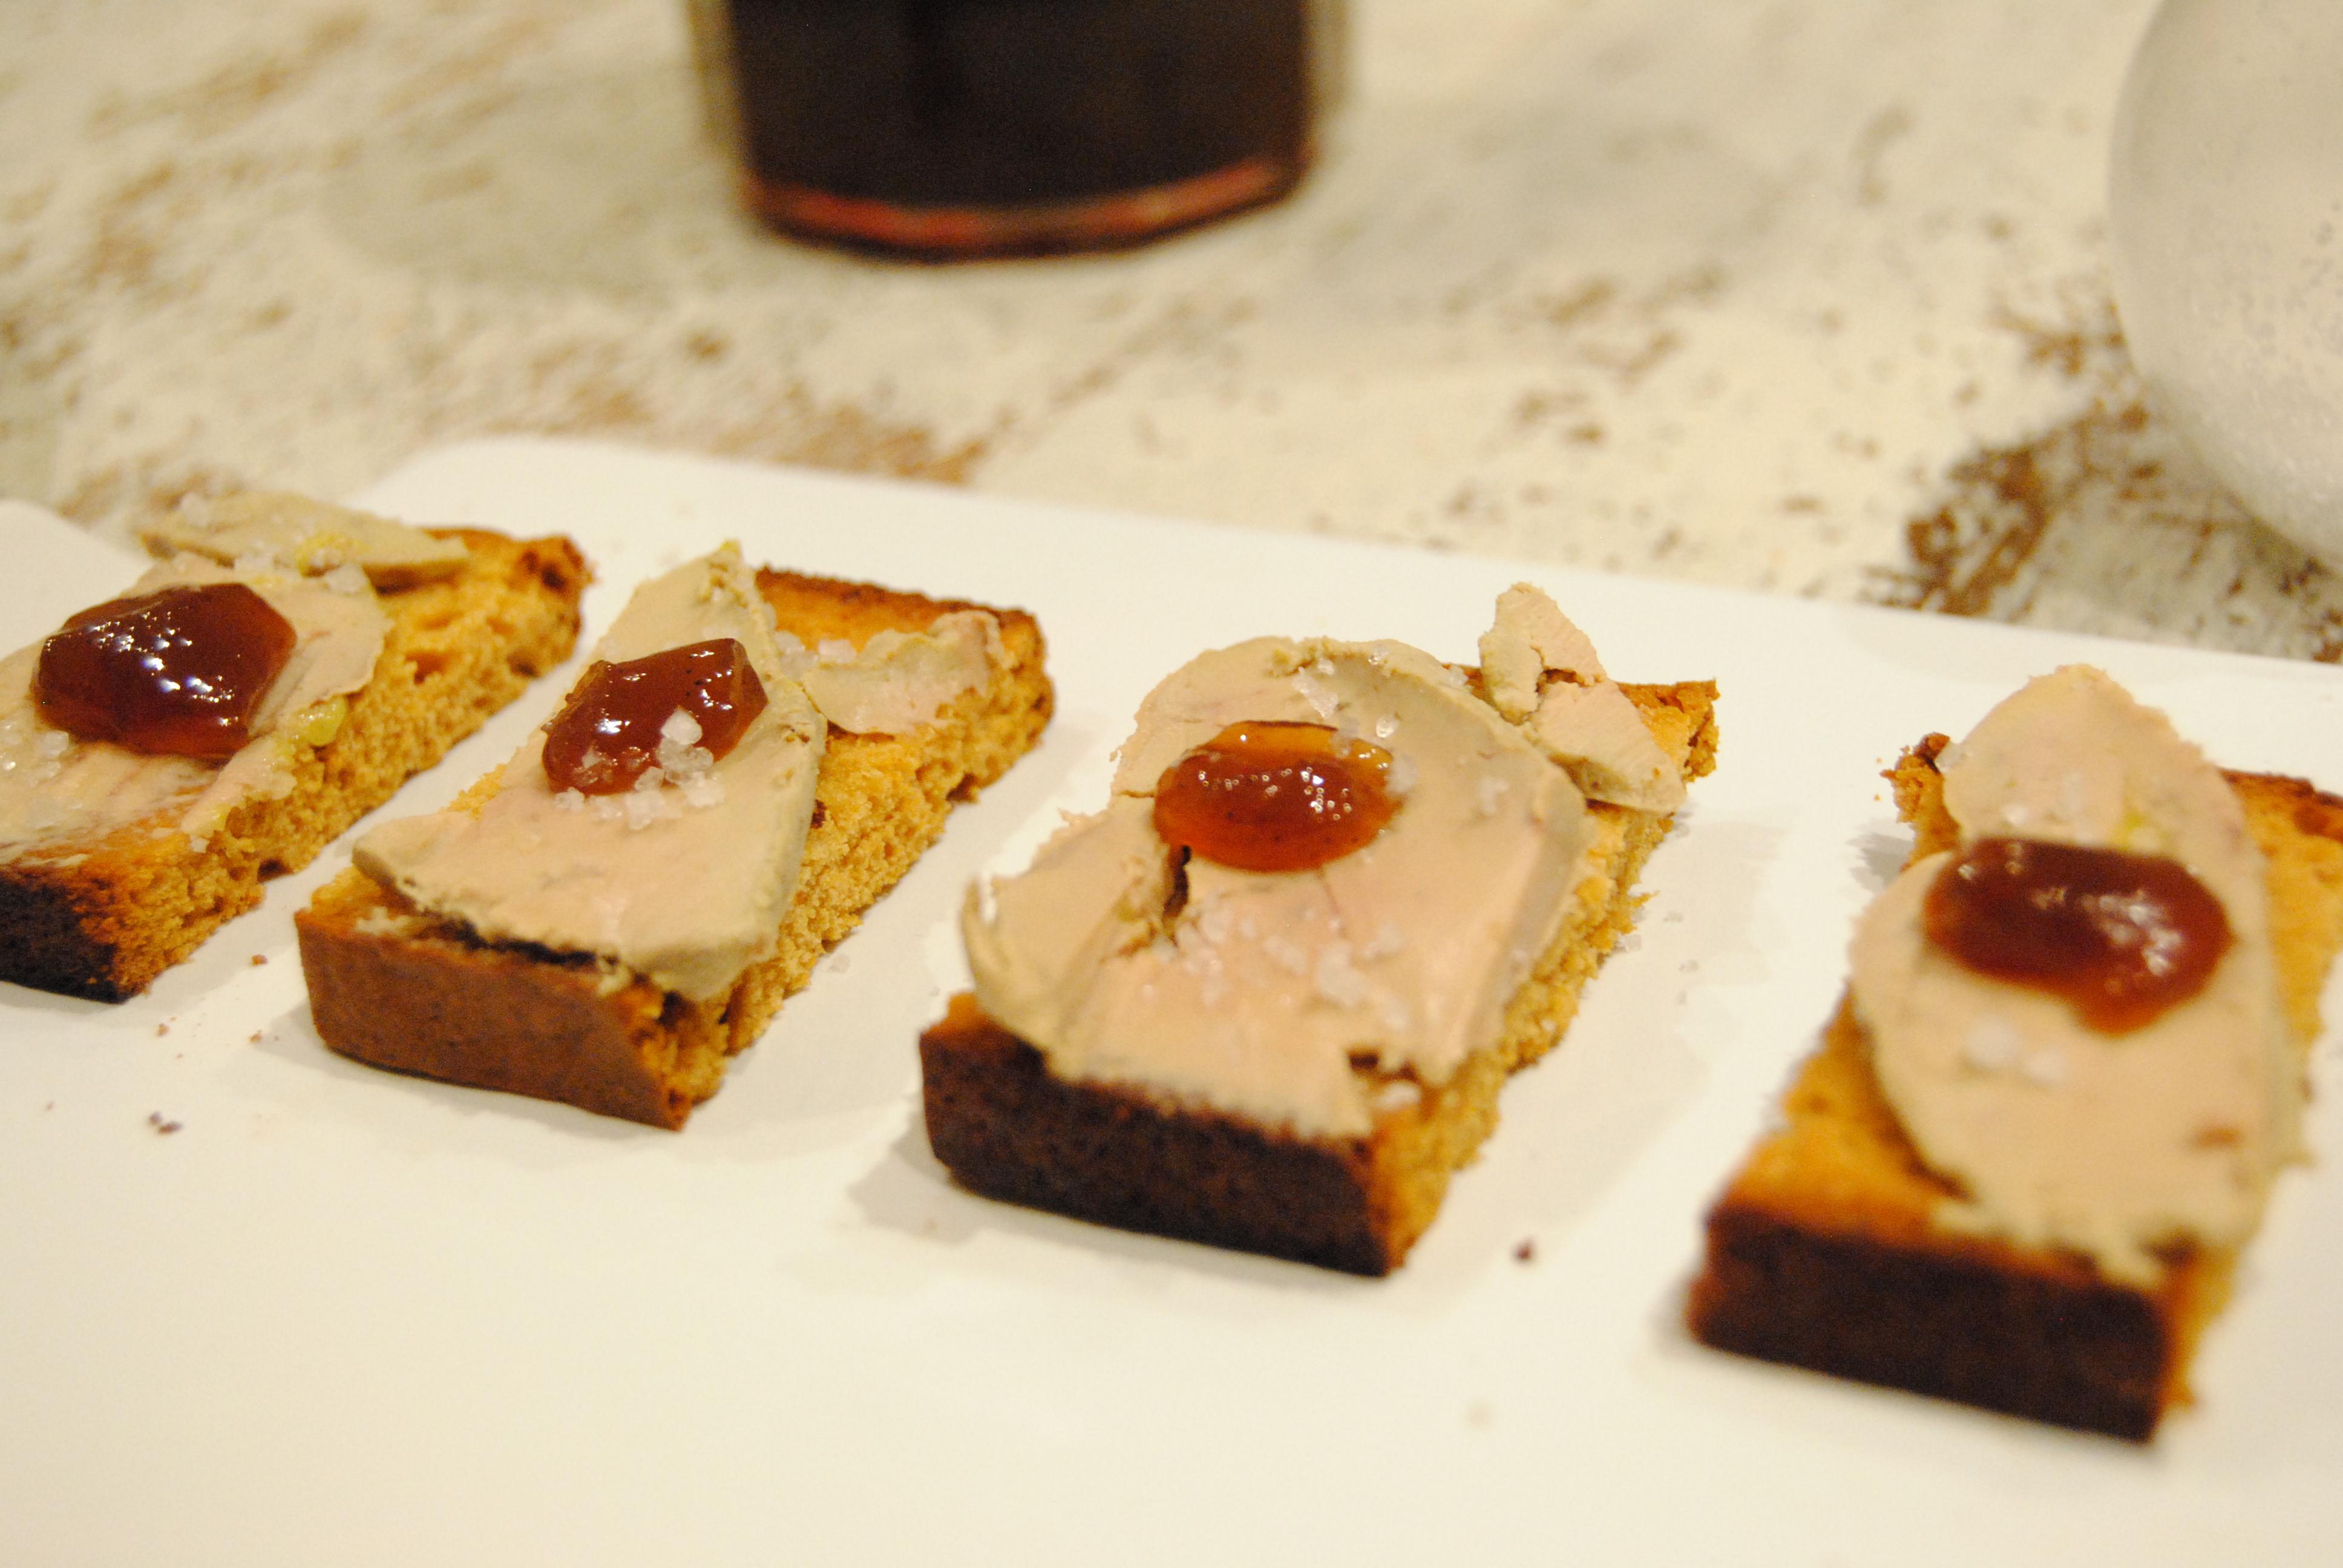 Zak De Nol 1 Toast De Foie Gras Revisit Happy Fridge